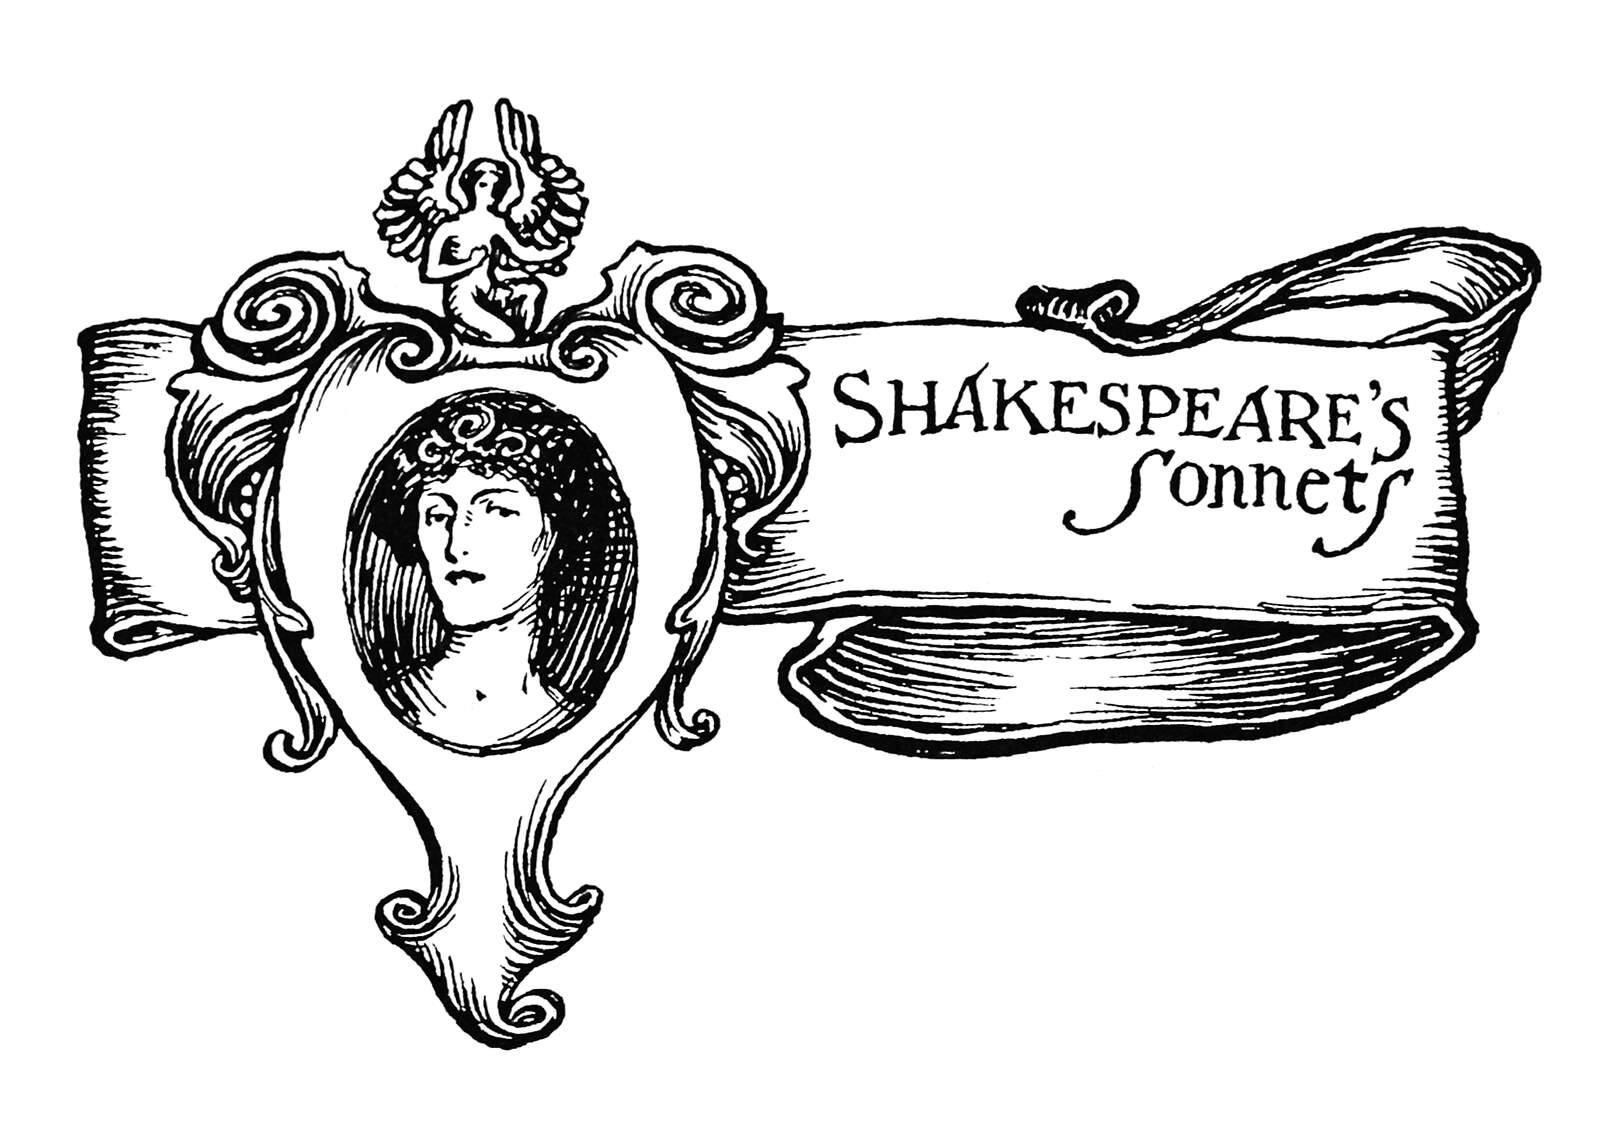 shakespeares-sonnets-headpiece-1600.jpg (1600×1135)